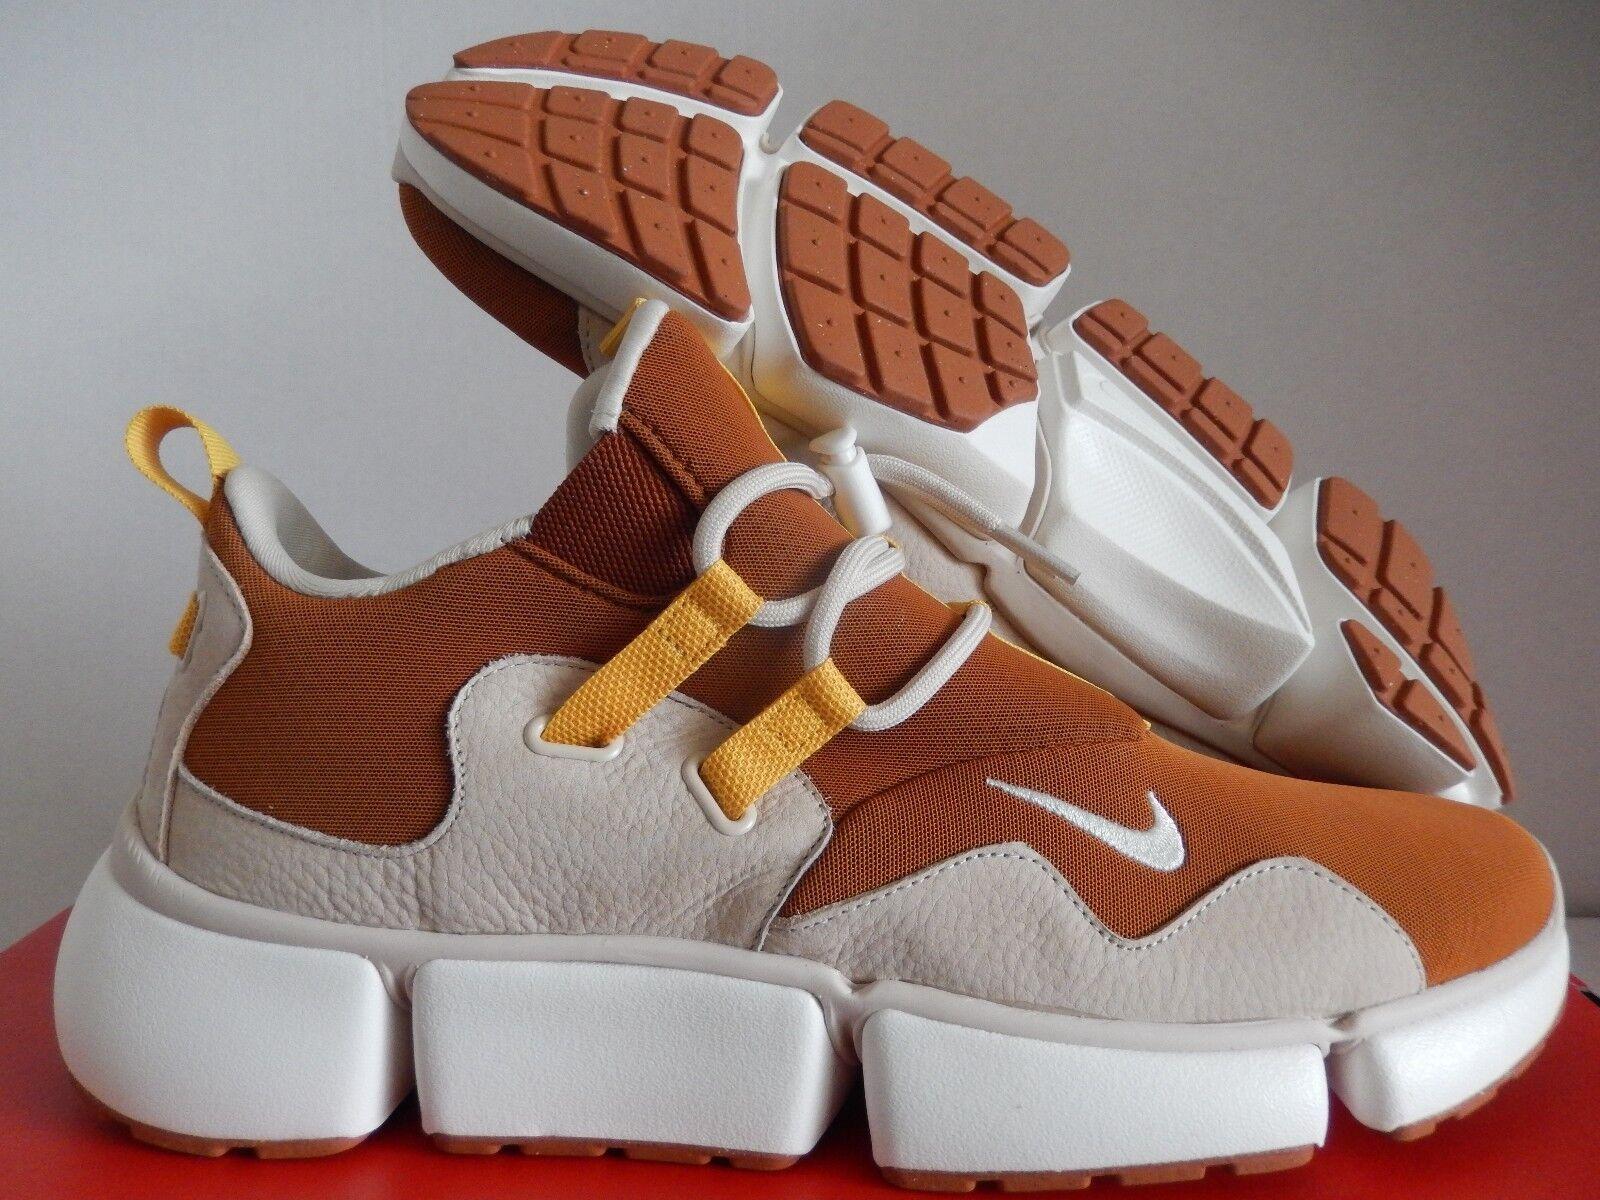 Nike nikelab coltellino dm 13 tawny brown-sail-mineral oro sz 13 dm [910571-200] 430731